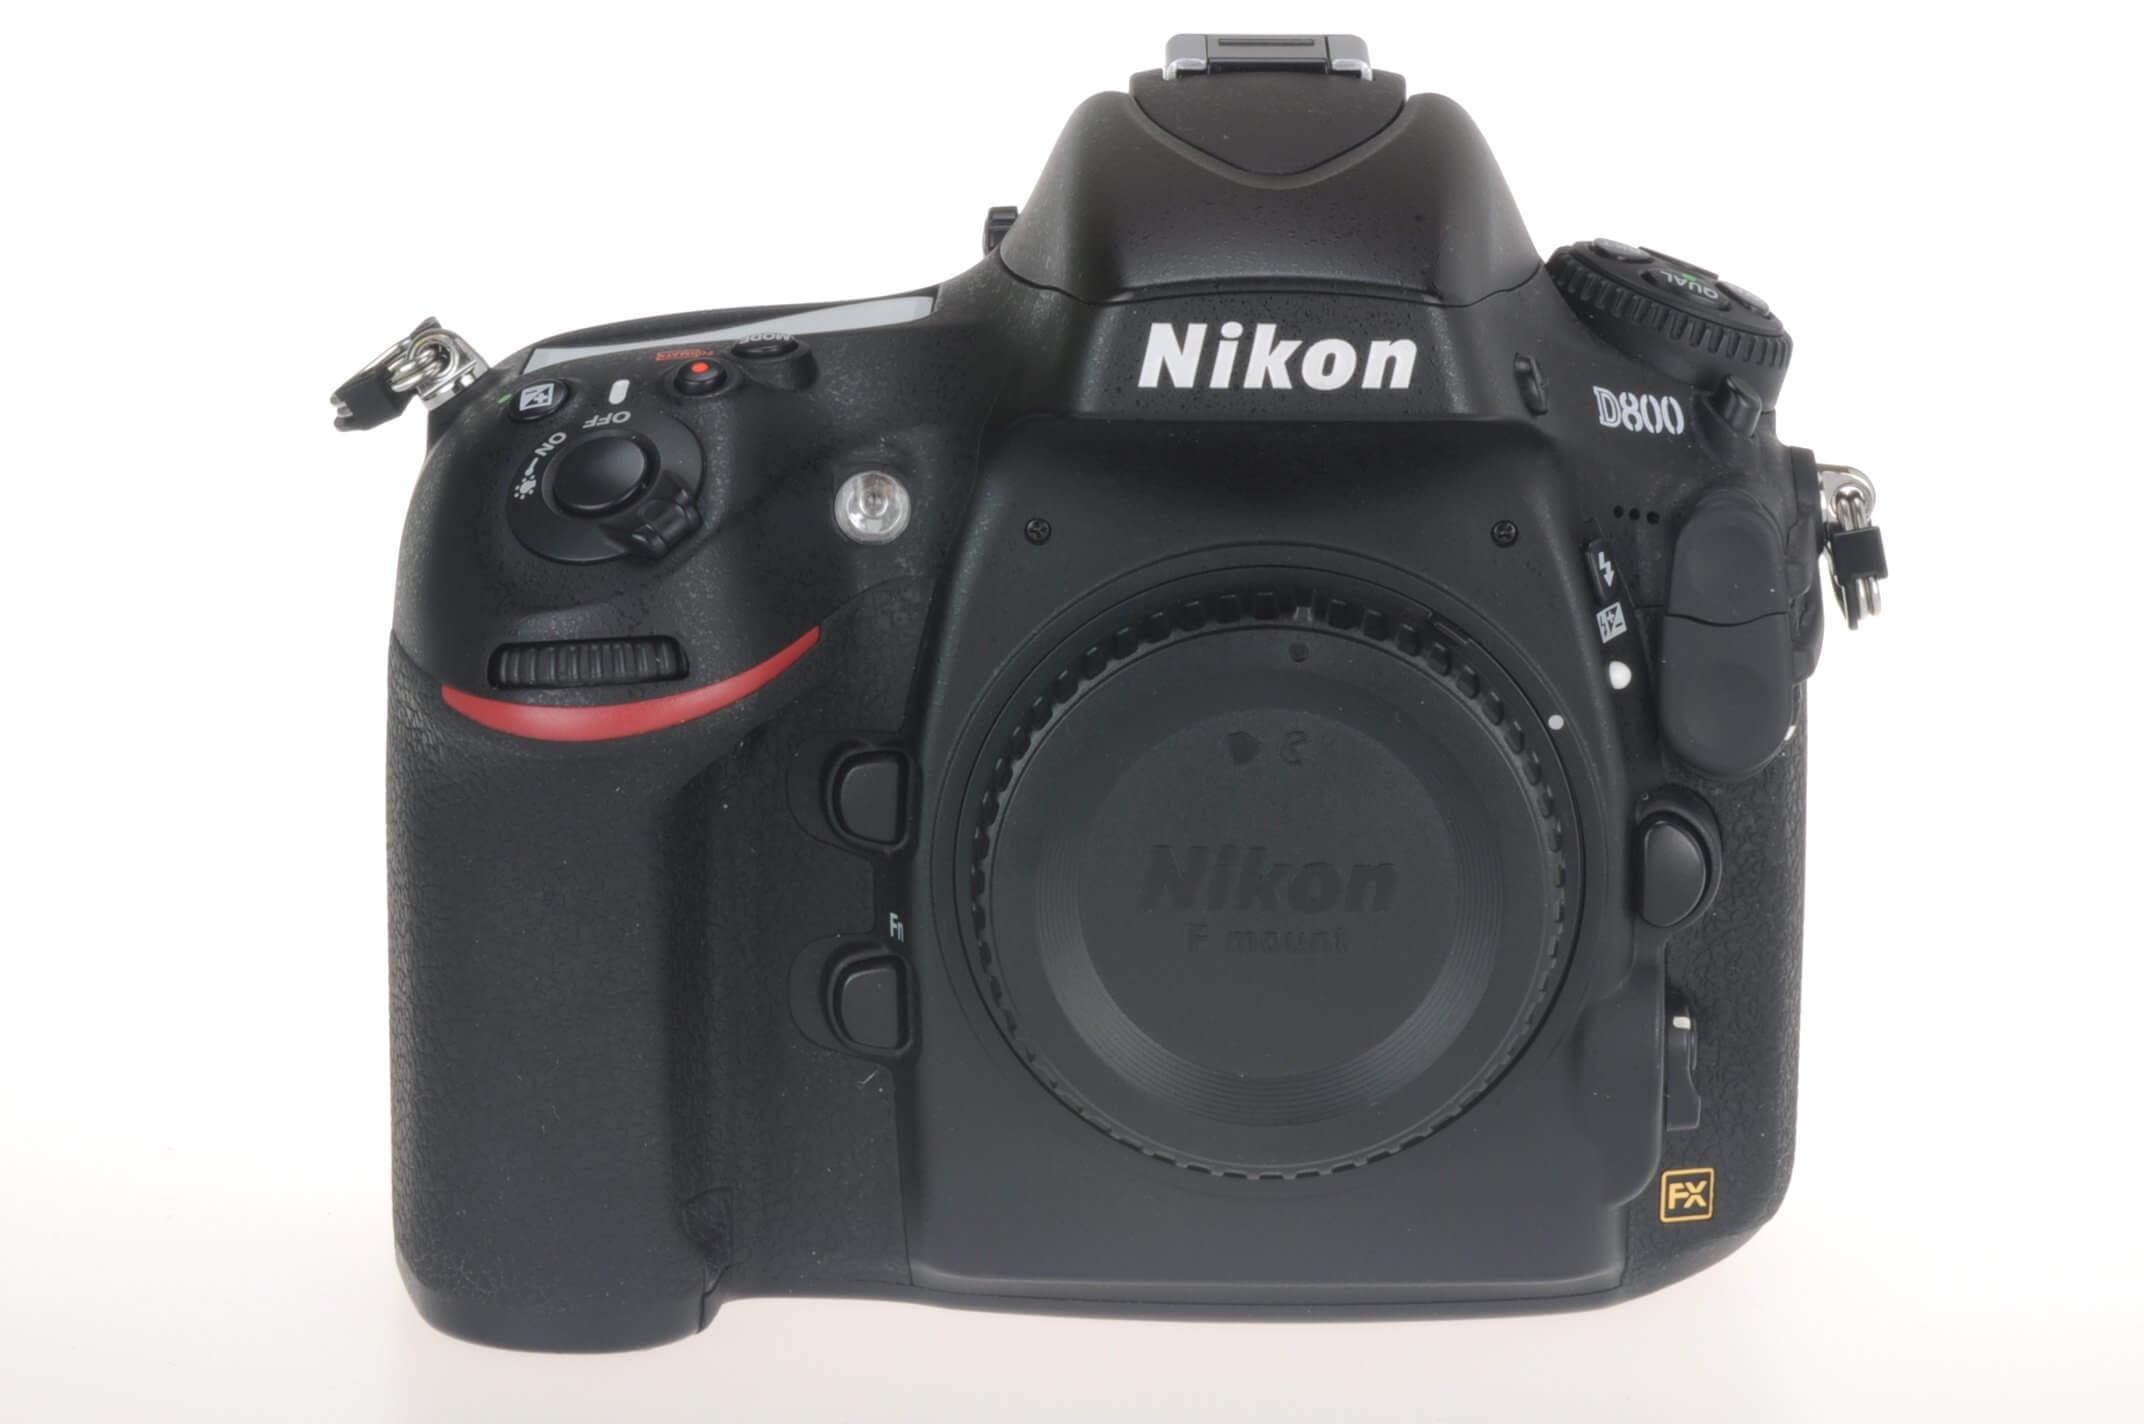 Nikon D800 body, box, 7518 actuations, virtually mint!